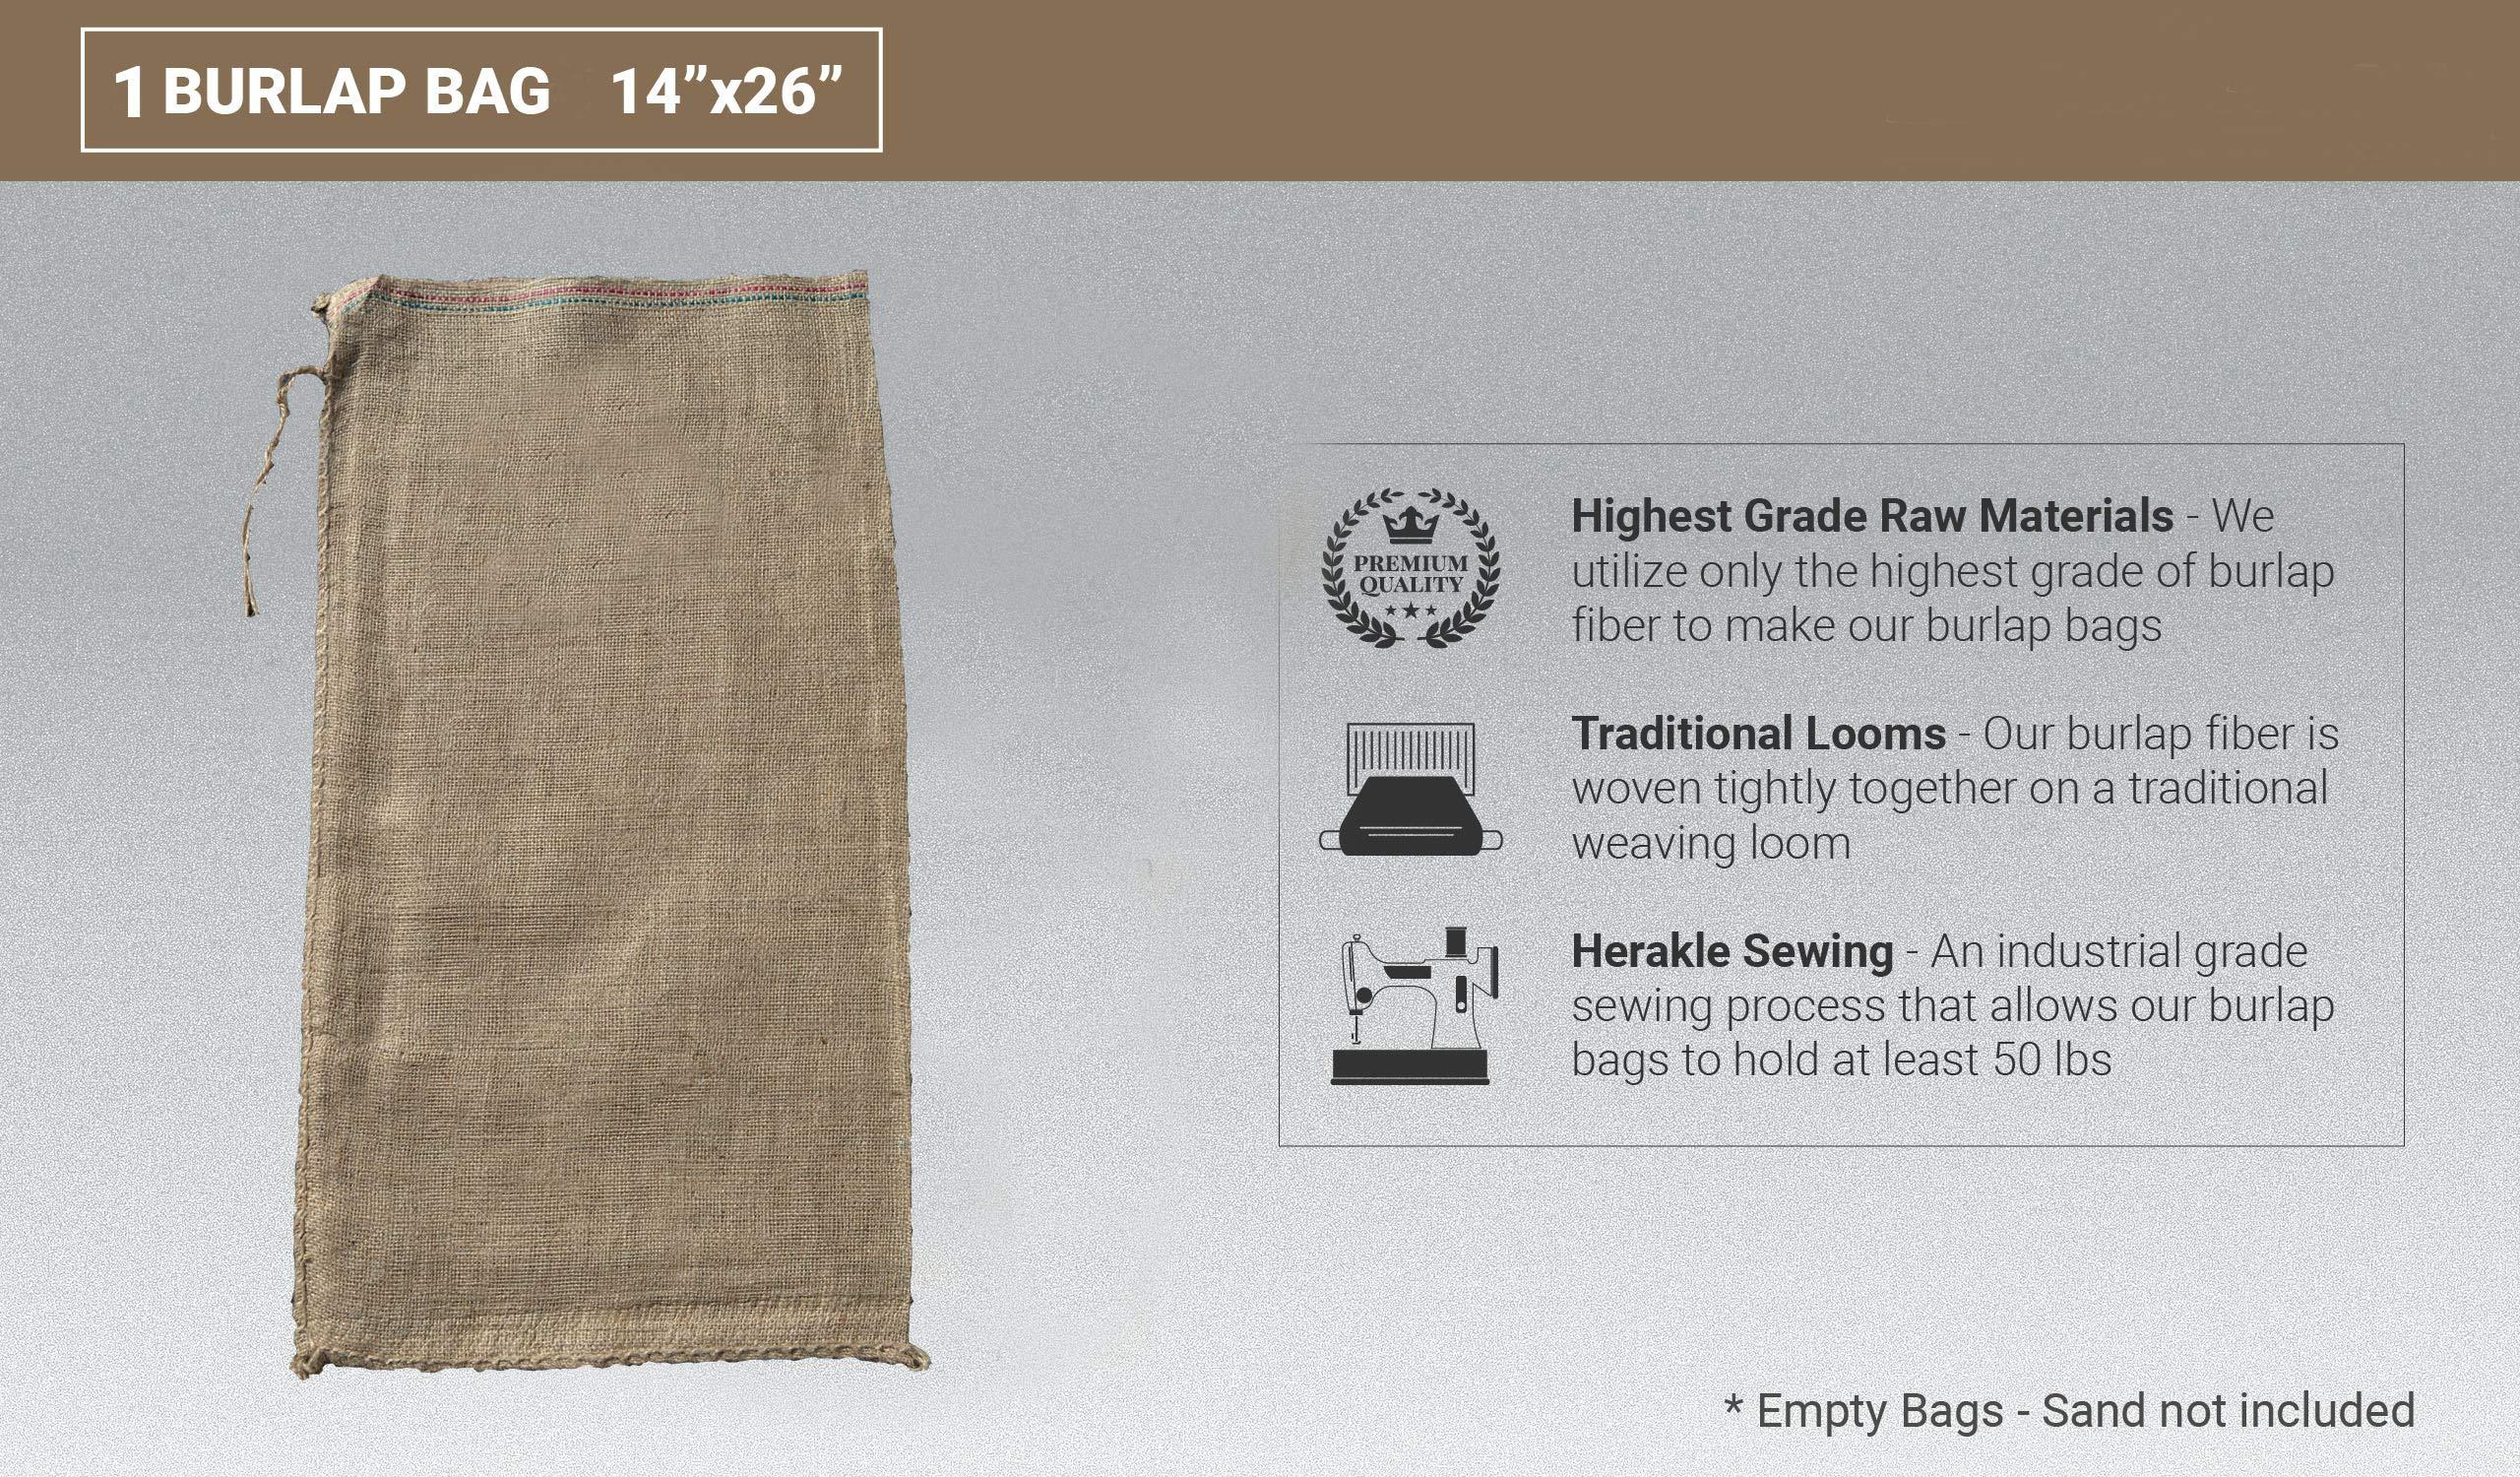 Sandbaggy Burlap Sand Bag - Size: 14'' x 26'' - Sandbags 50lb Weight Capacity - Sandbags for Flooding - Sand Bag - Flood Water Barrier - Water Curb - Tent Sandbags - Store Bags (1 Bags) by Sandbaggy (Image #2)